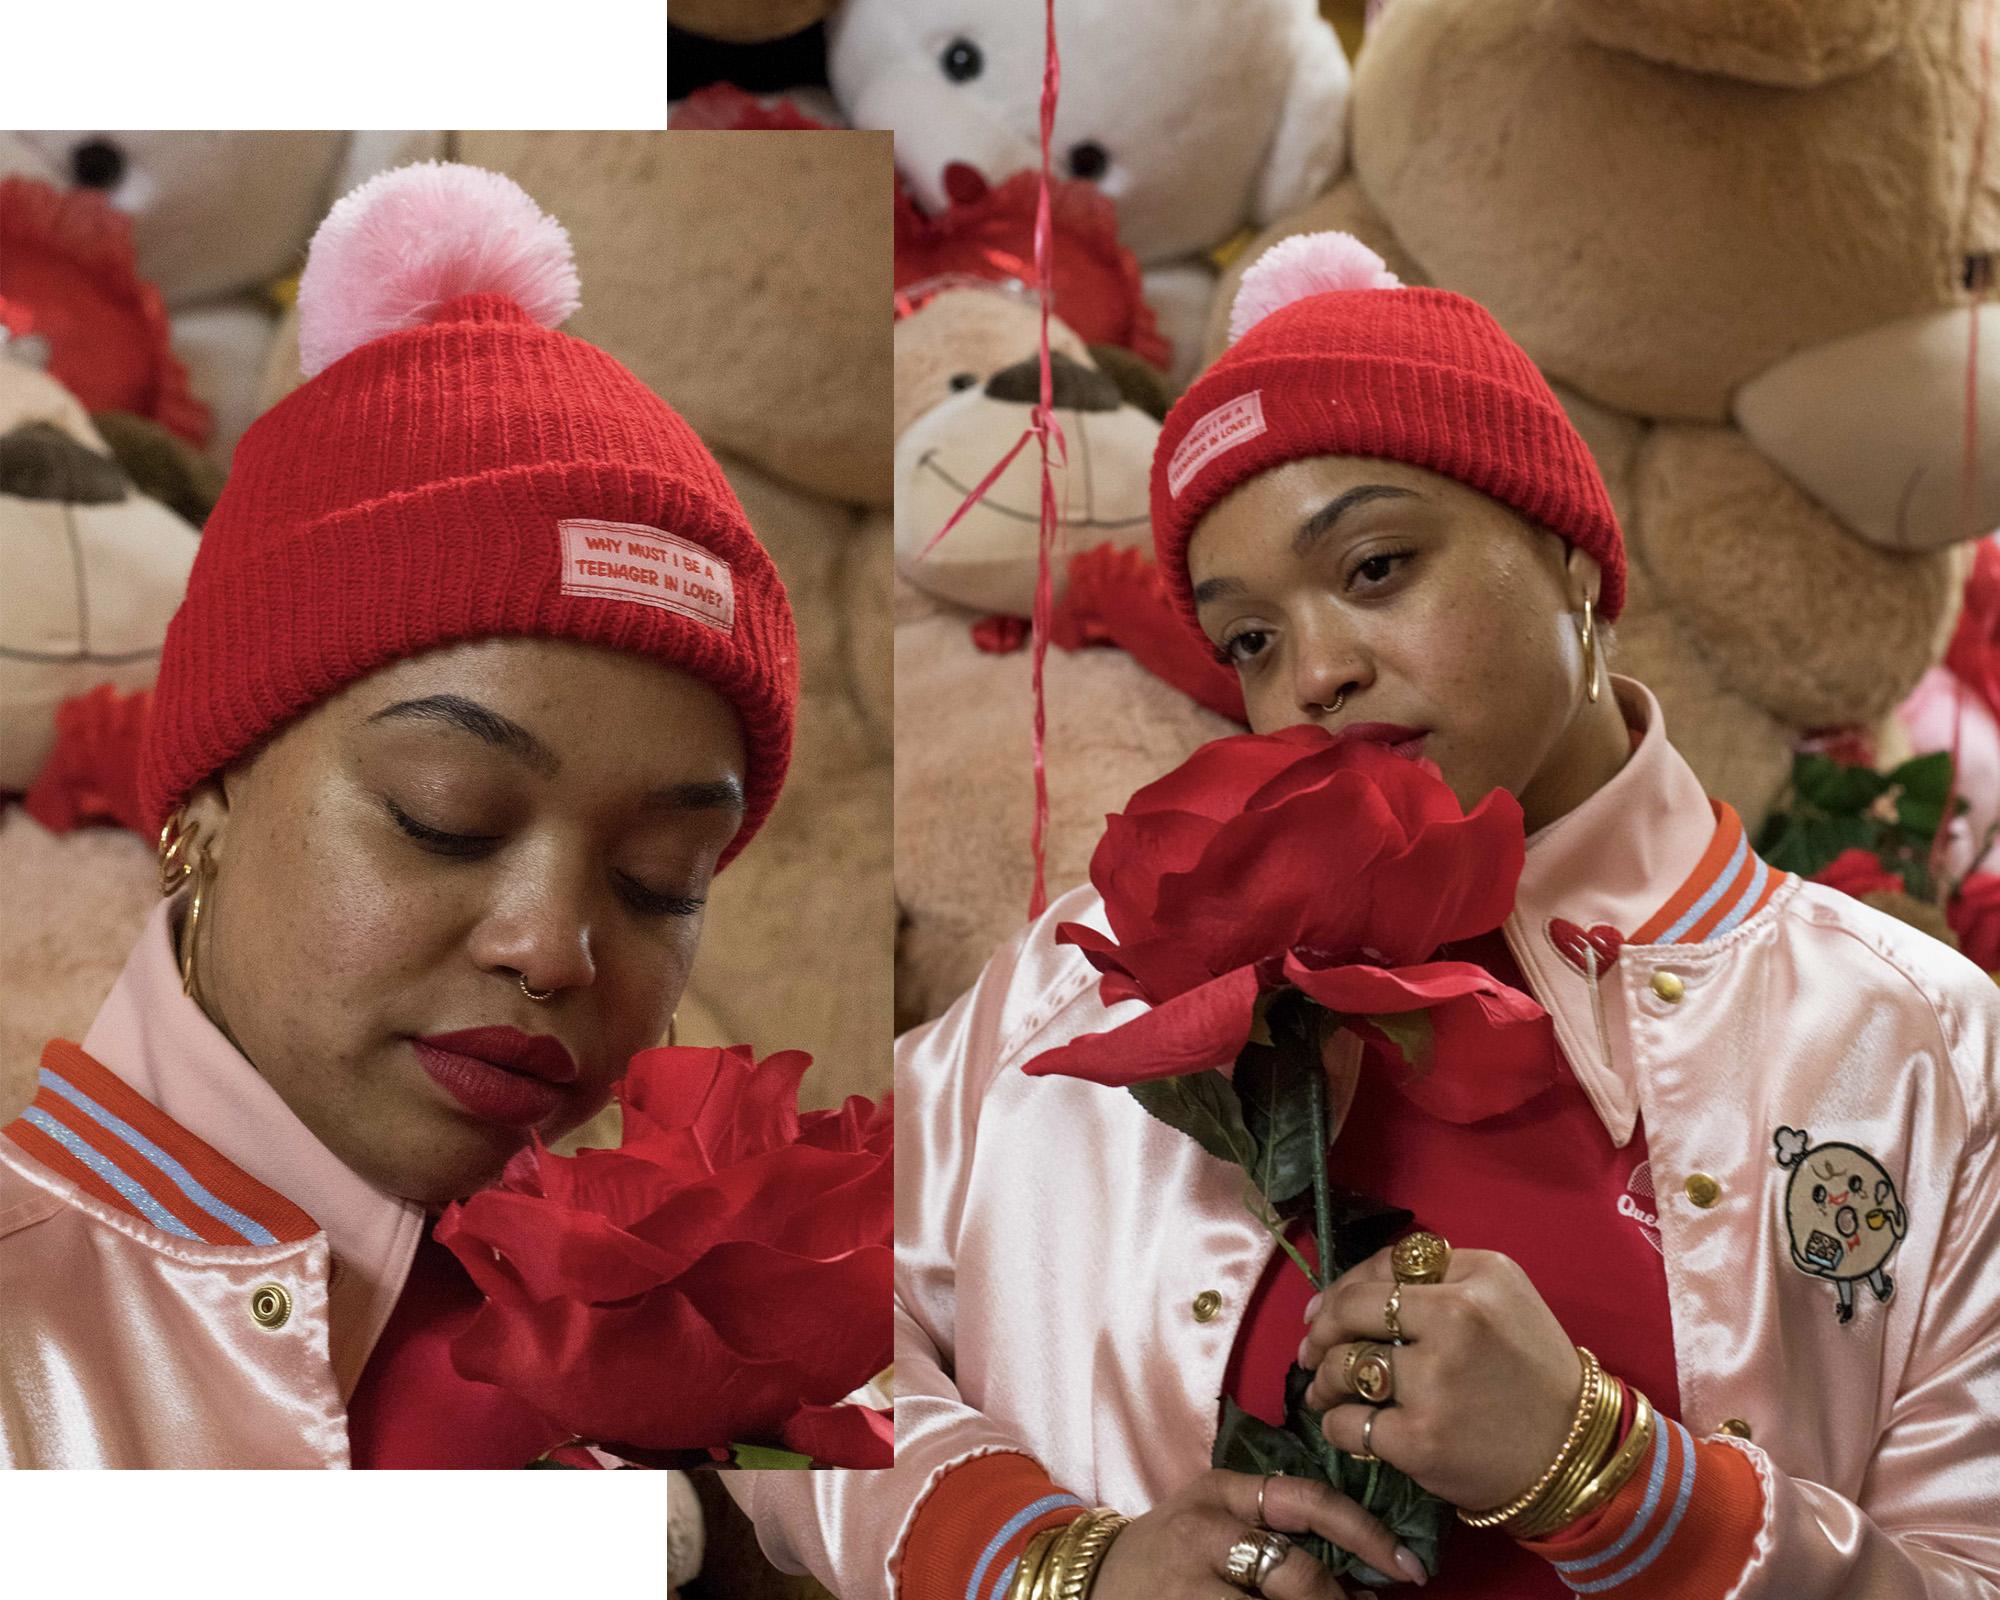 Teenager In Love beanie (US$35)